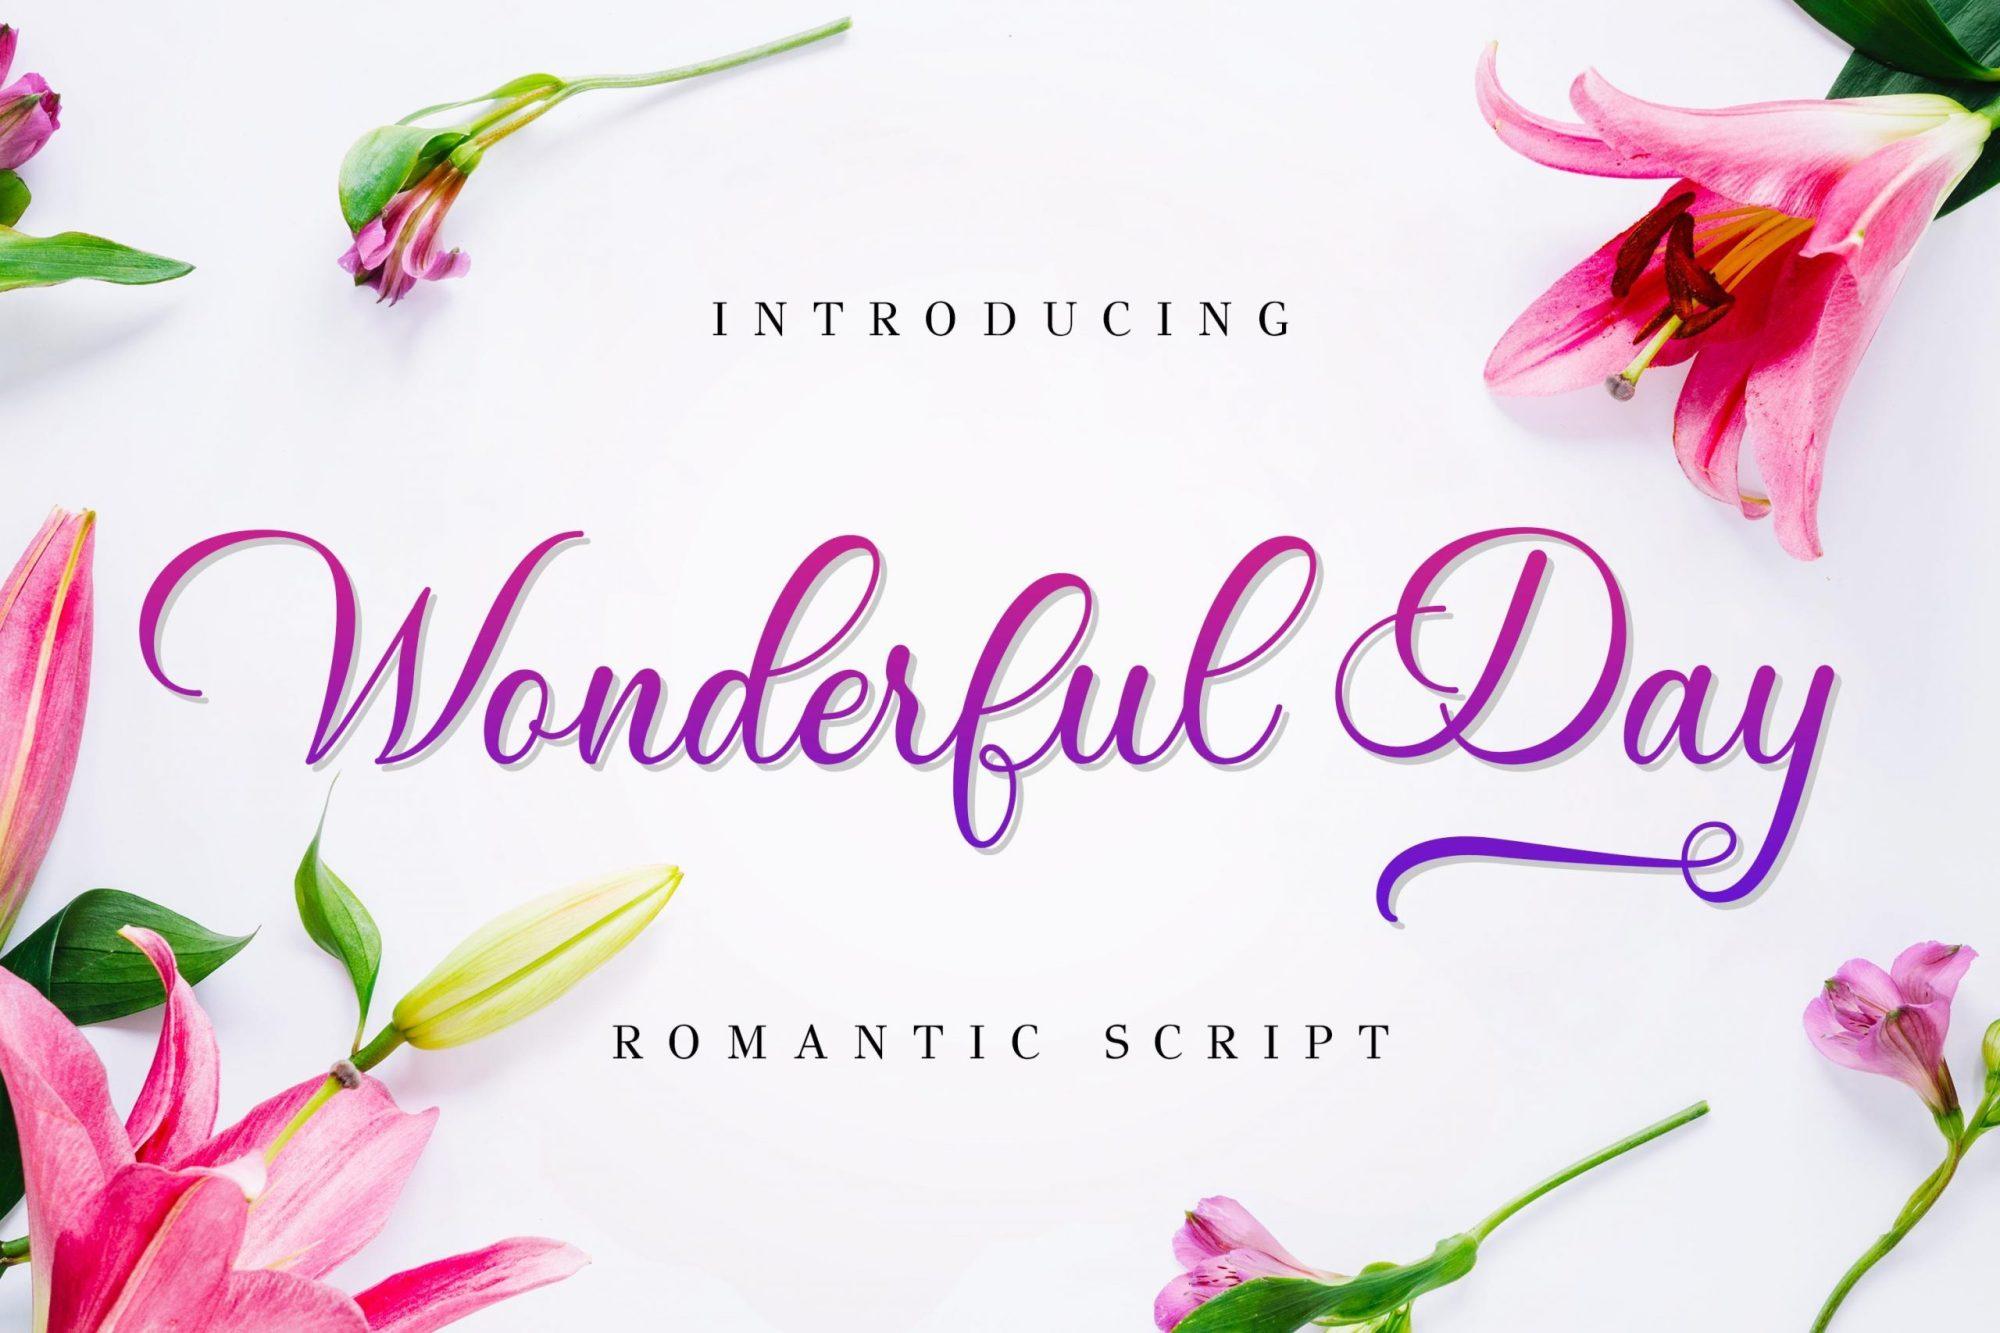 Wonderful-Day-Romantic-Calligraphy-Script-Font